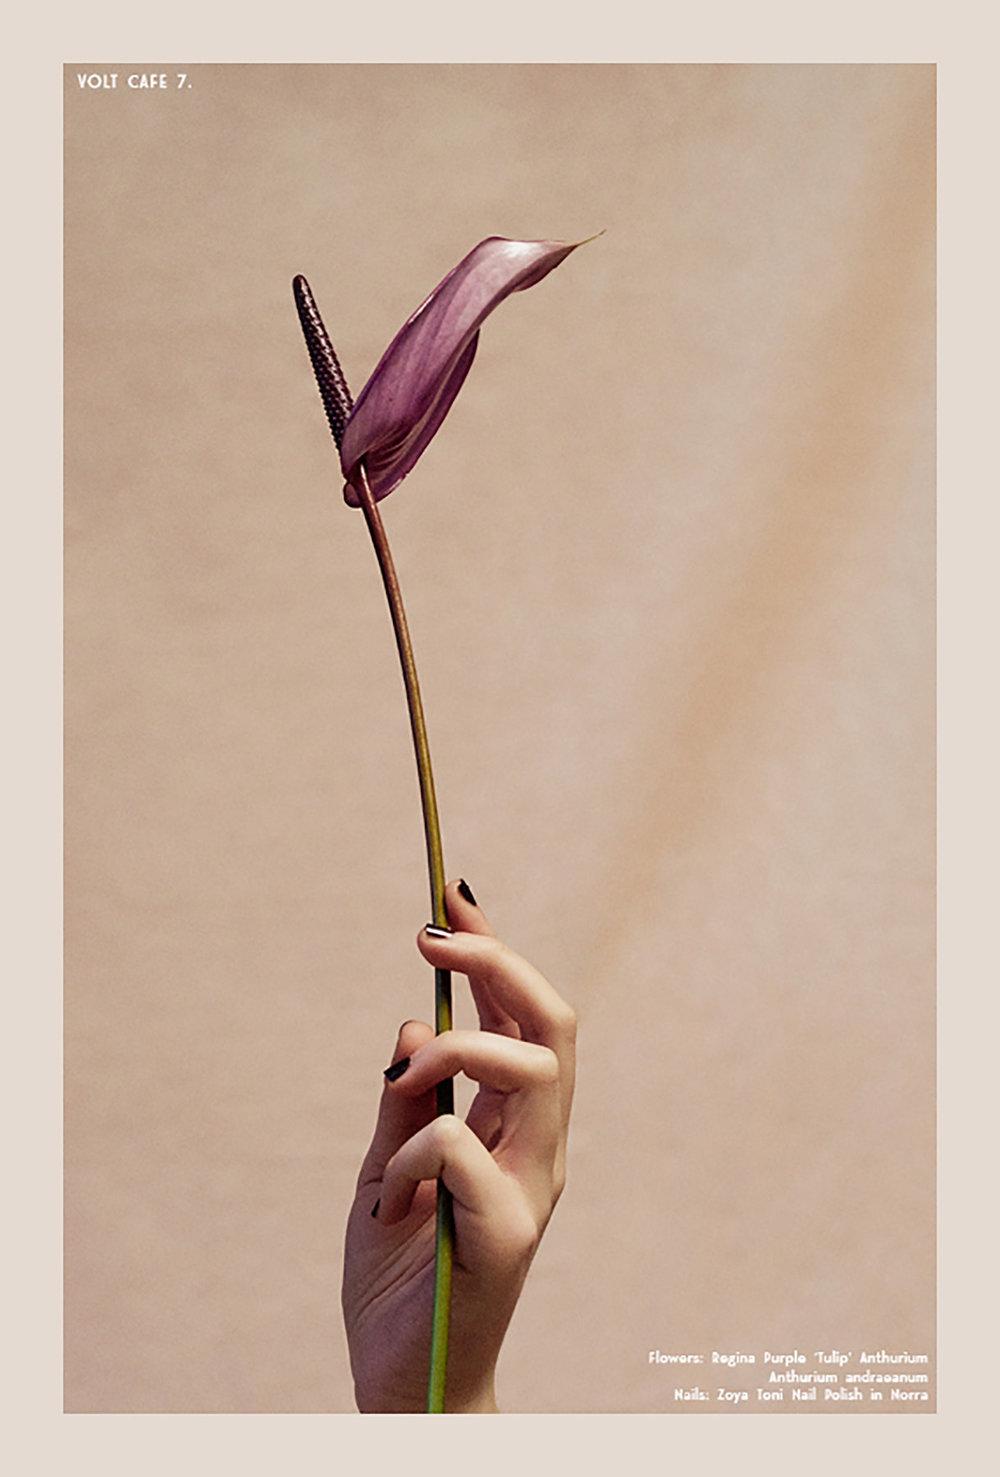 035-icon-artist-management-Kristin-Vicari-Beauty-Volt.jpg